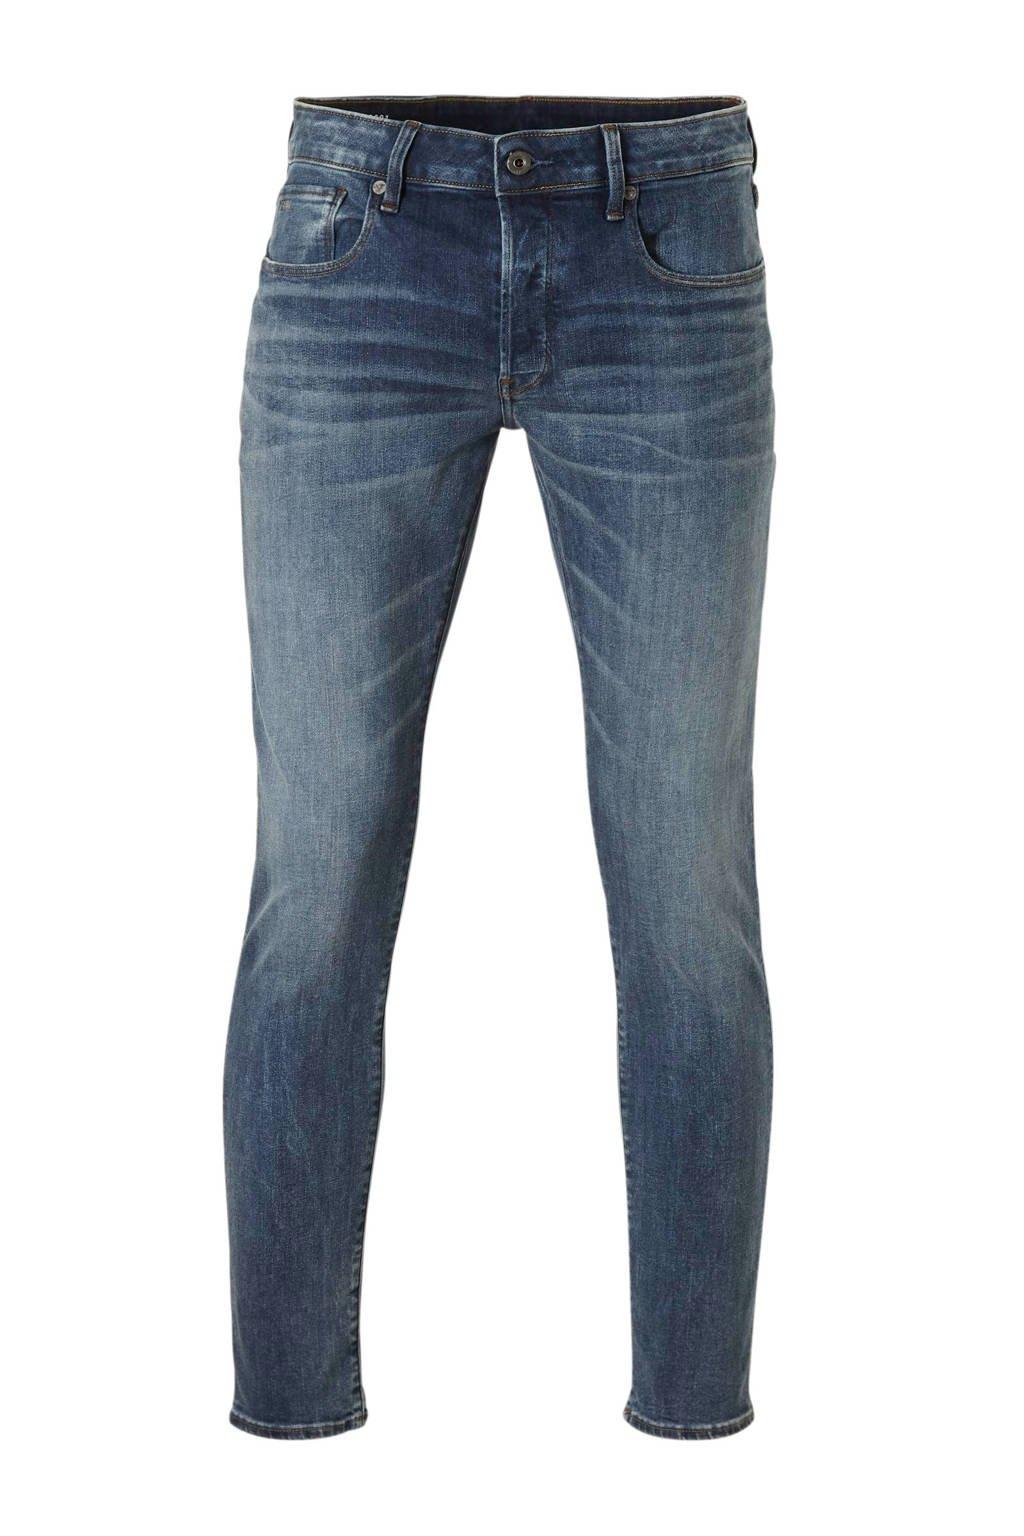 G-Star RAW 3301 straight fit jeans, Dark denim